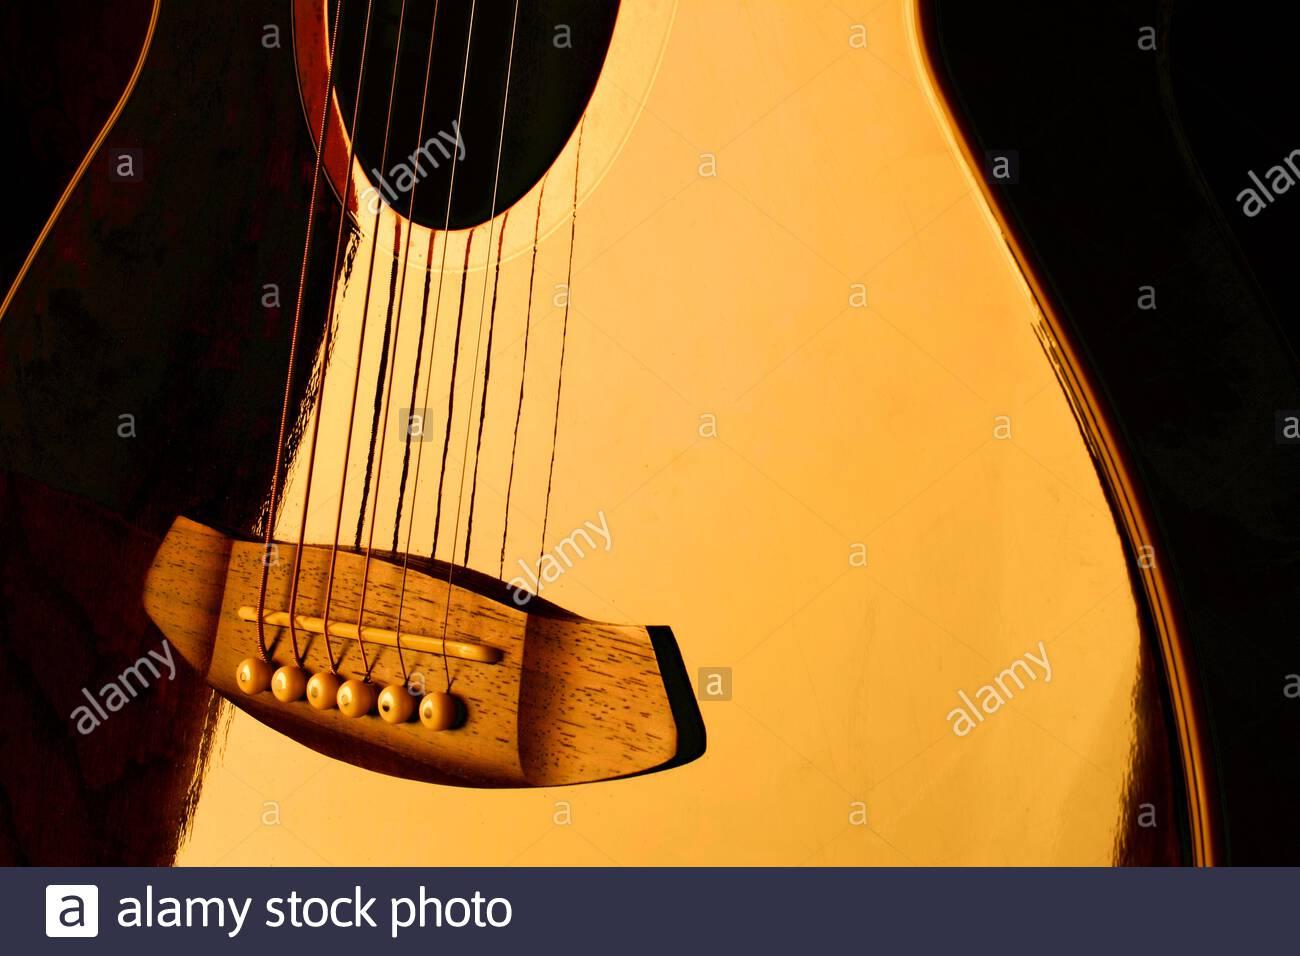 close-up-of-an-electro-acoustic-guitar-reflecting-golden-light-2AP4TDP.jpg